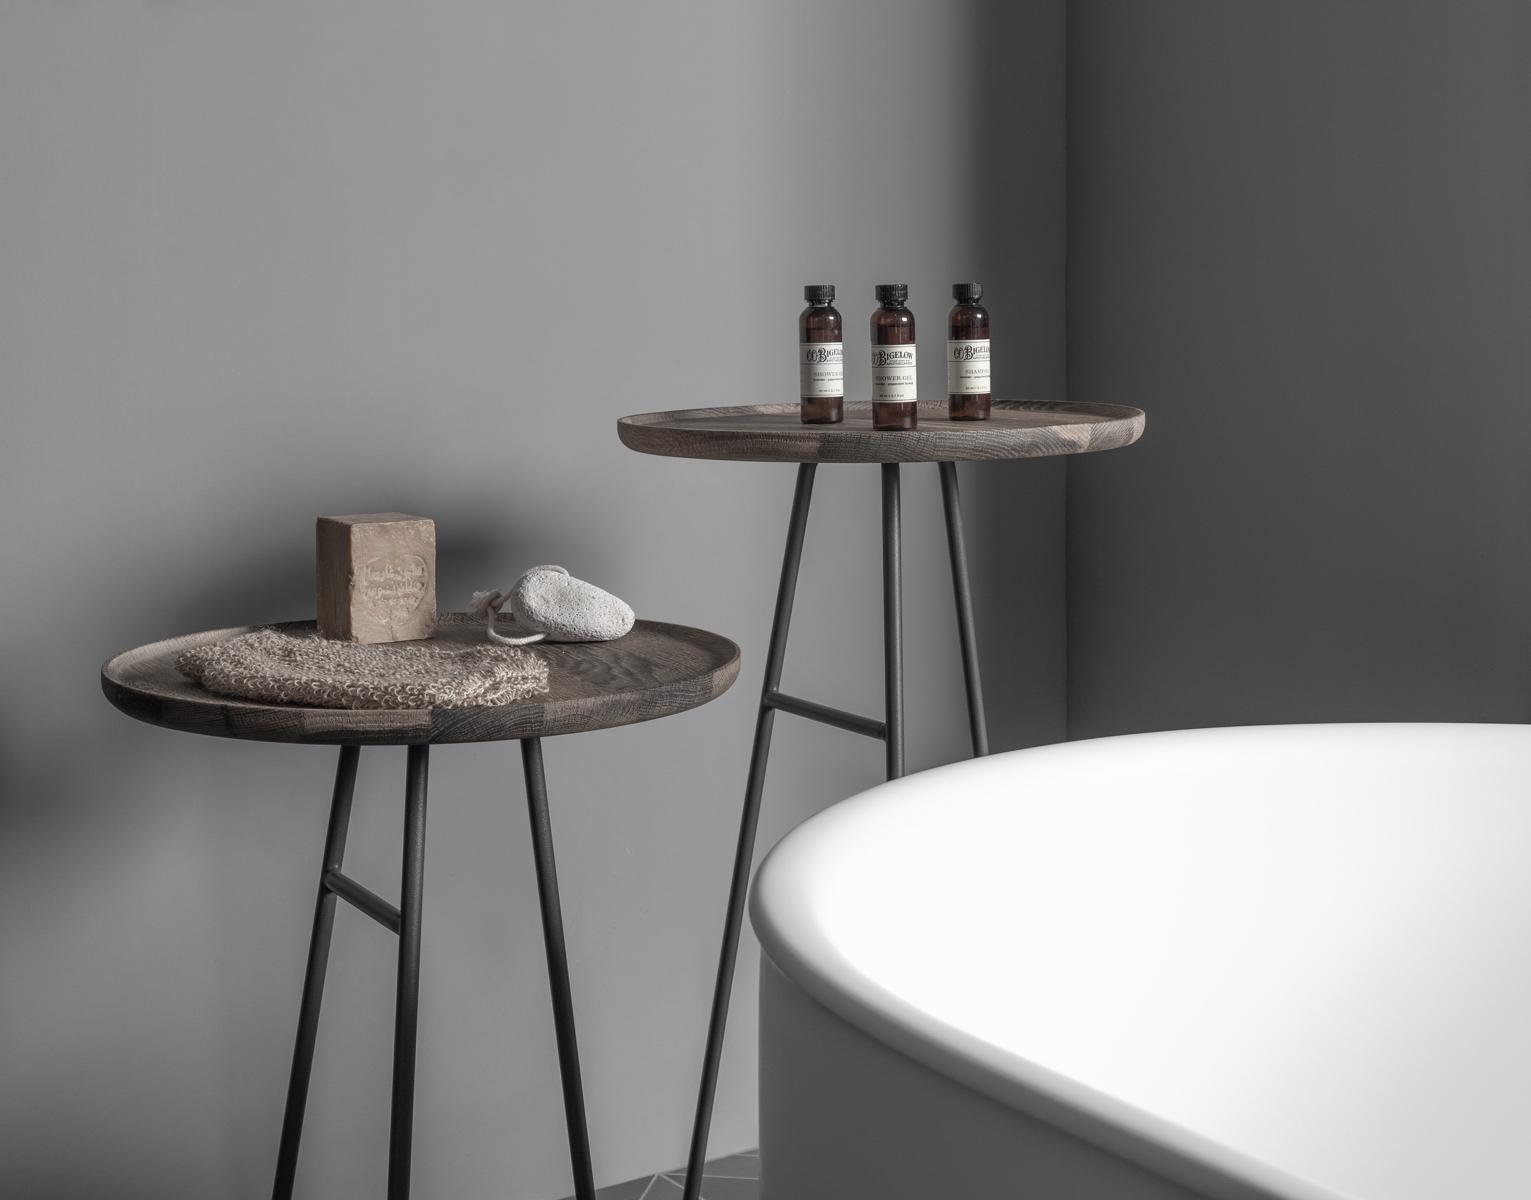 Tray designed by Debiasi Sandri